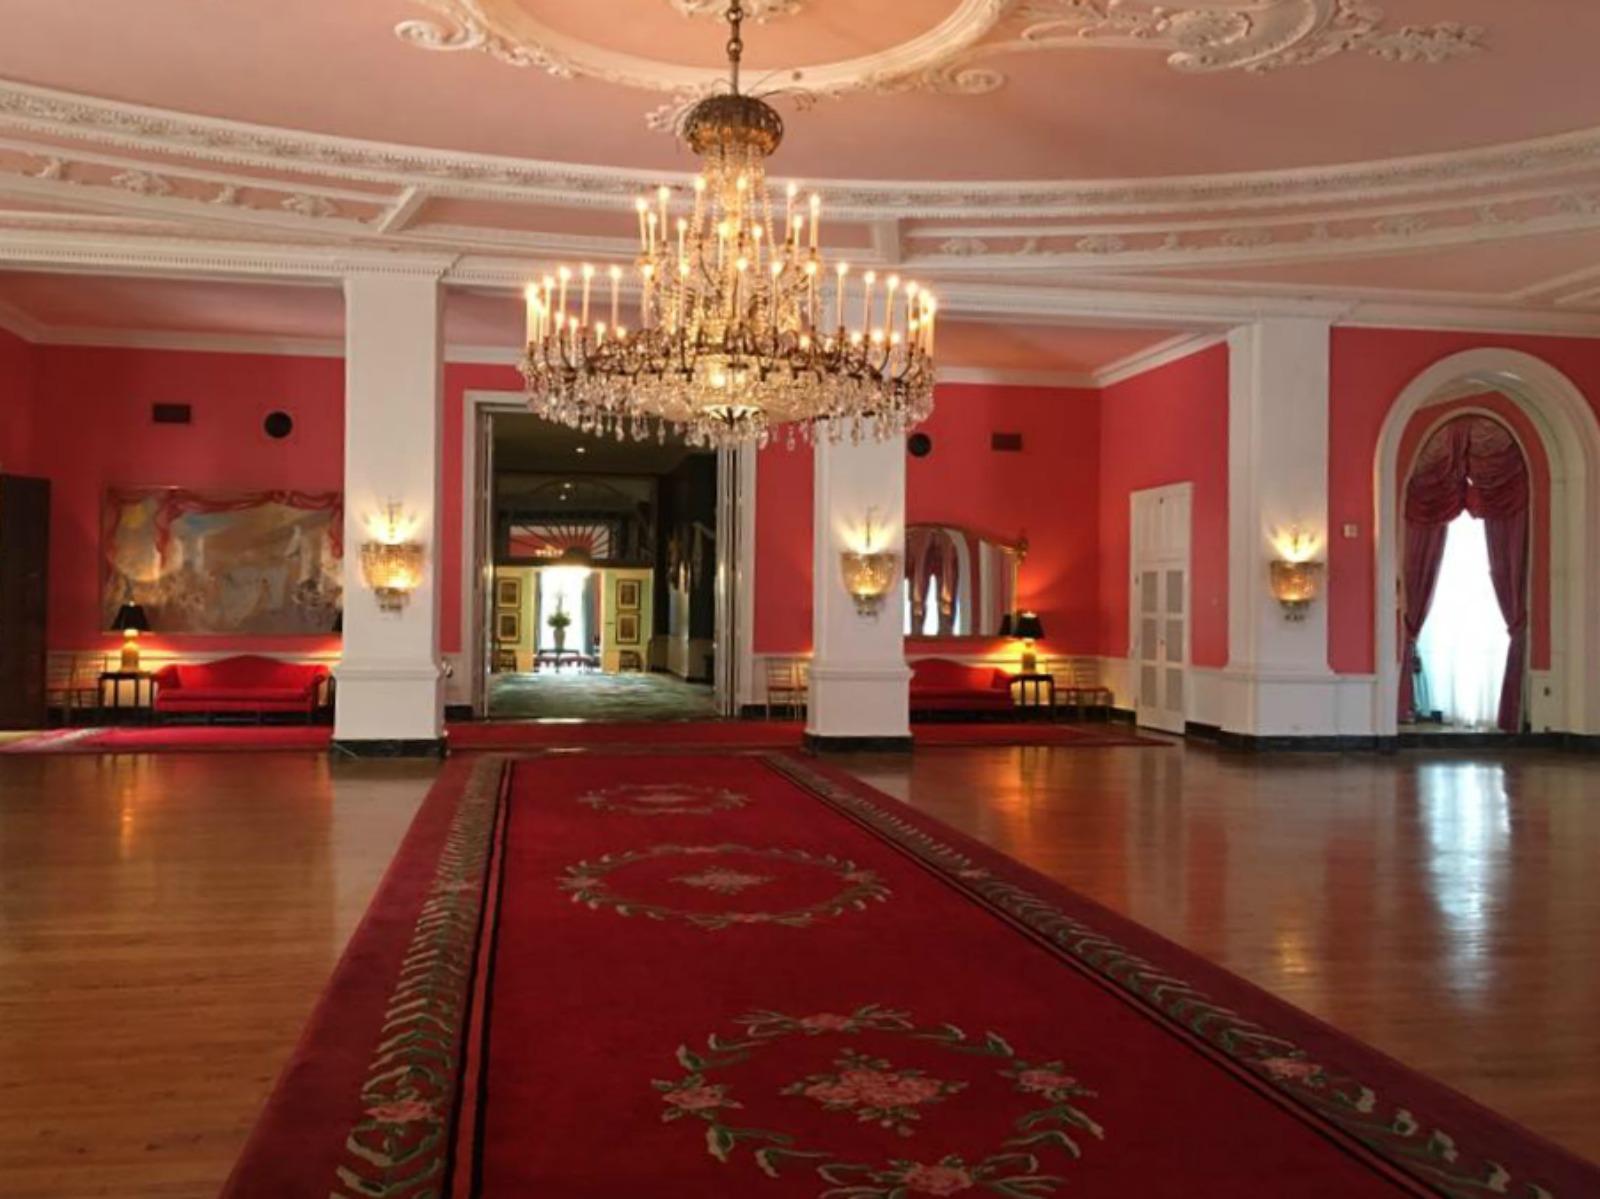 greenbrier resort, anniversary trip, ballroom